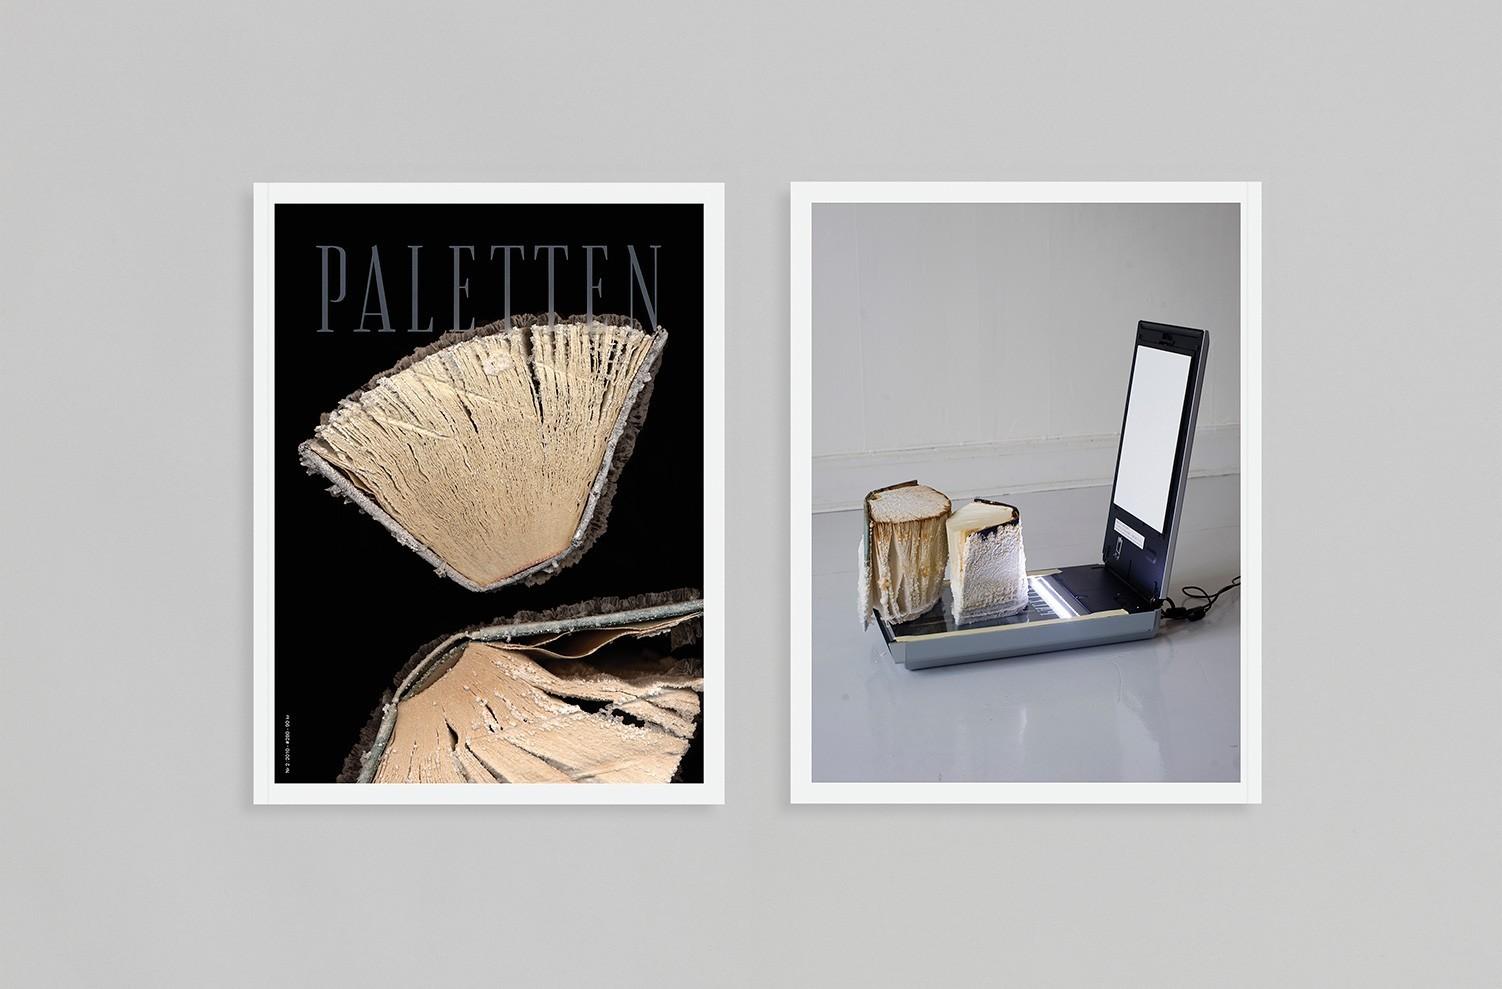 ritator_paletten_redesign_one_art_magazine_6